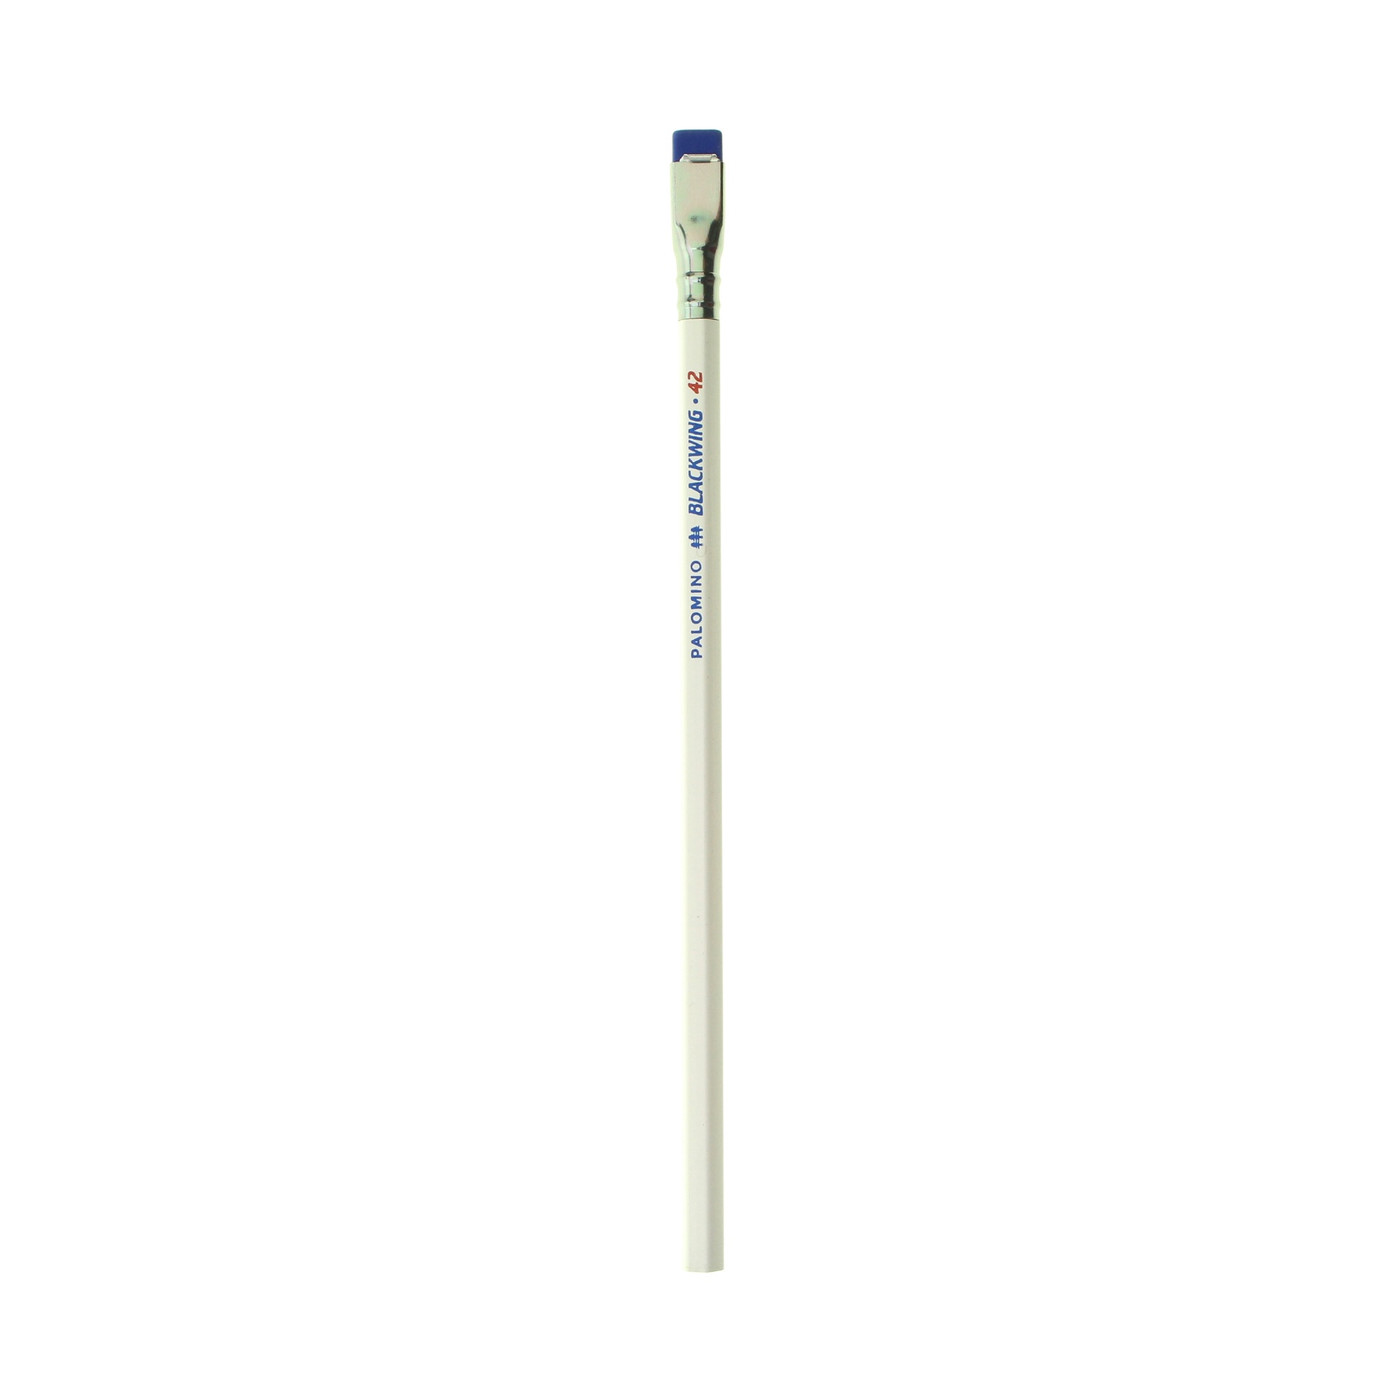 Blackwing pencil - Volume 42 (balanced)